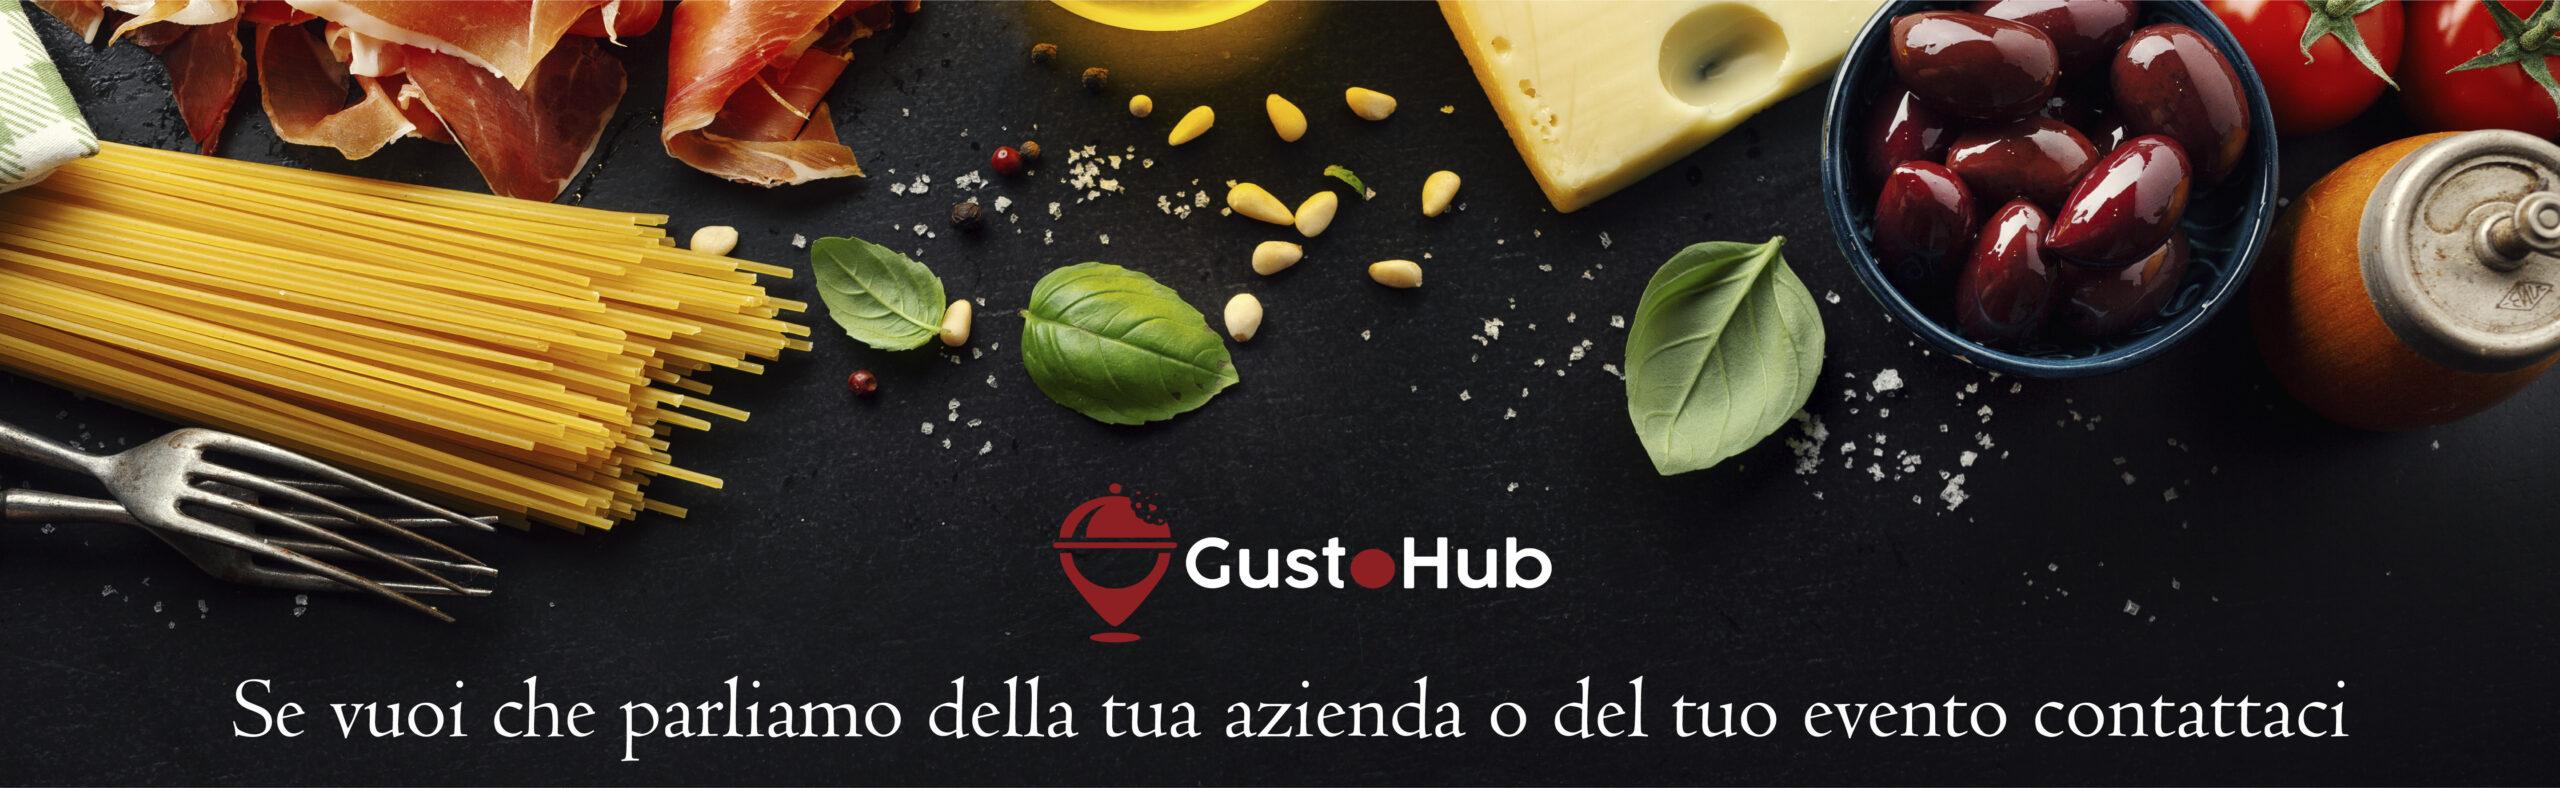 GUSTO HUB